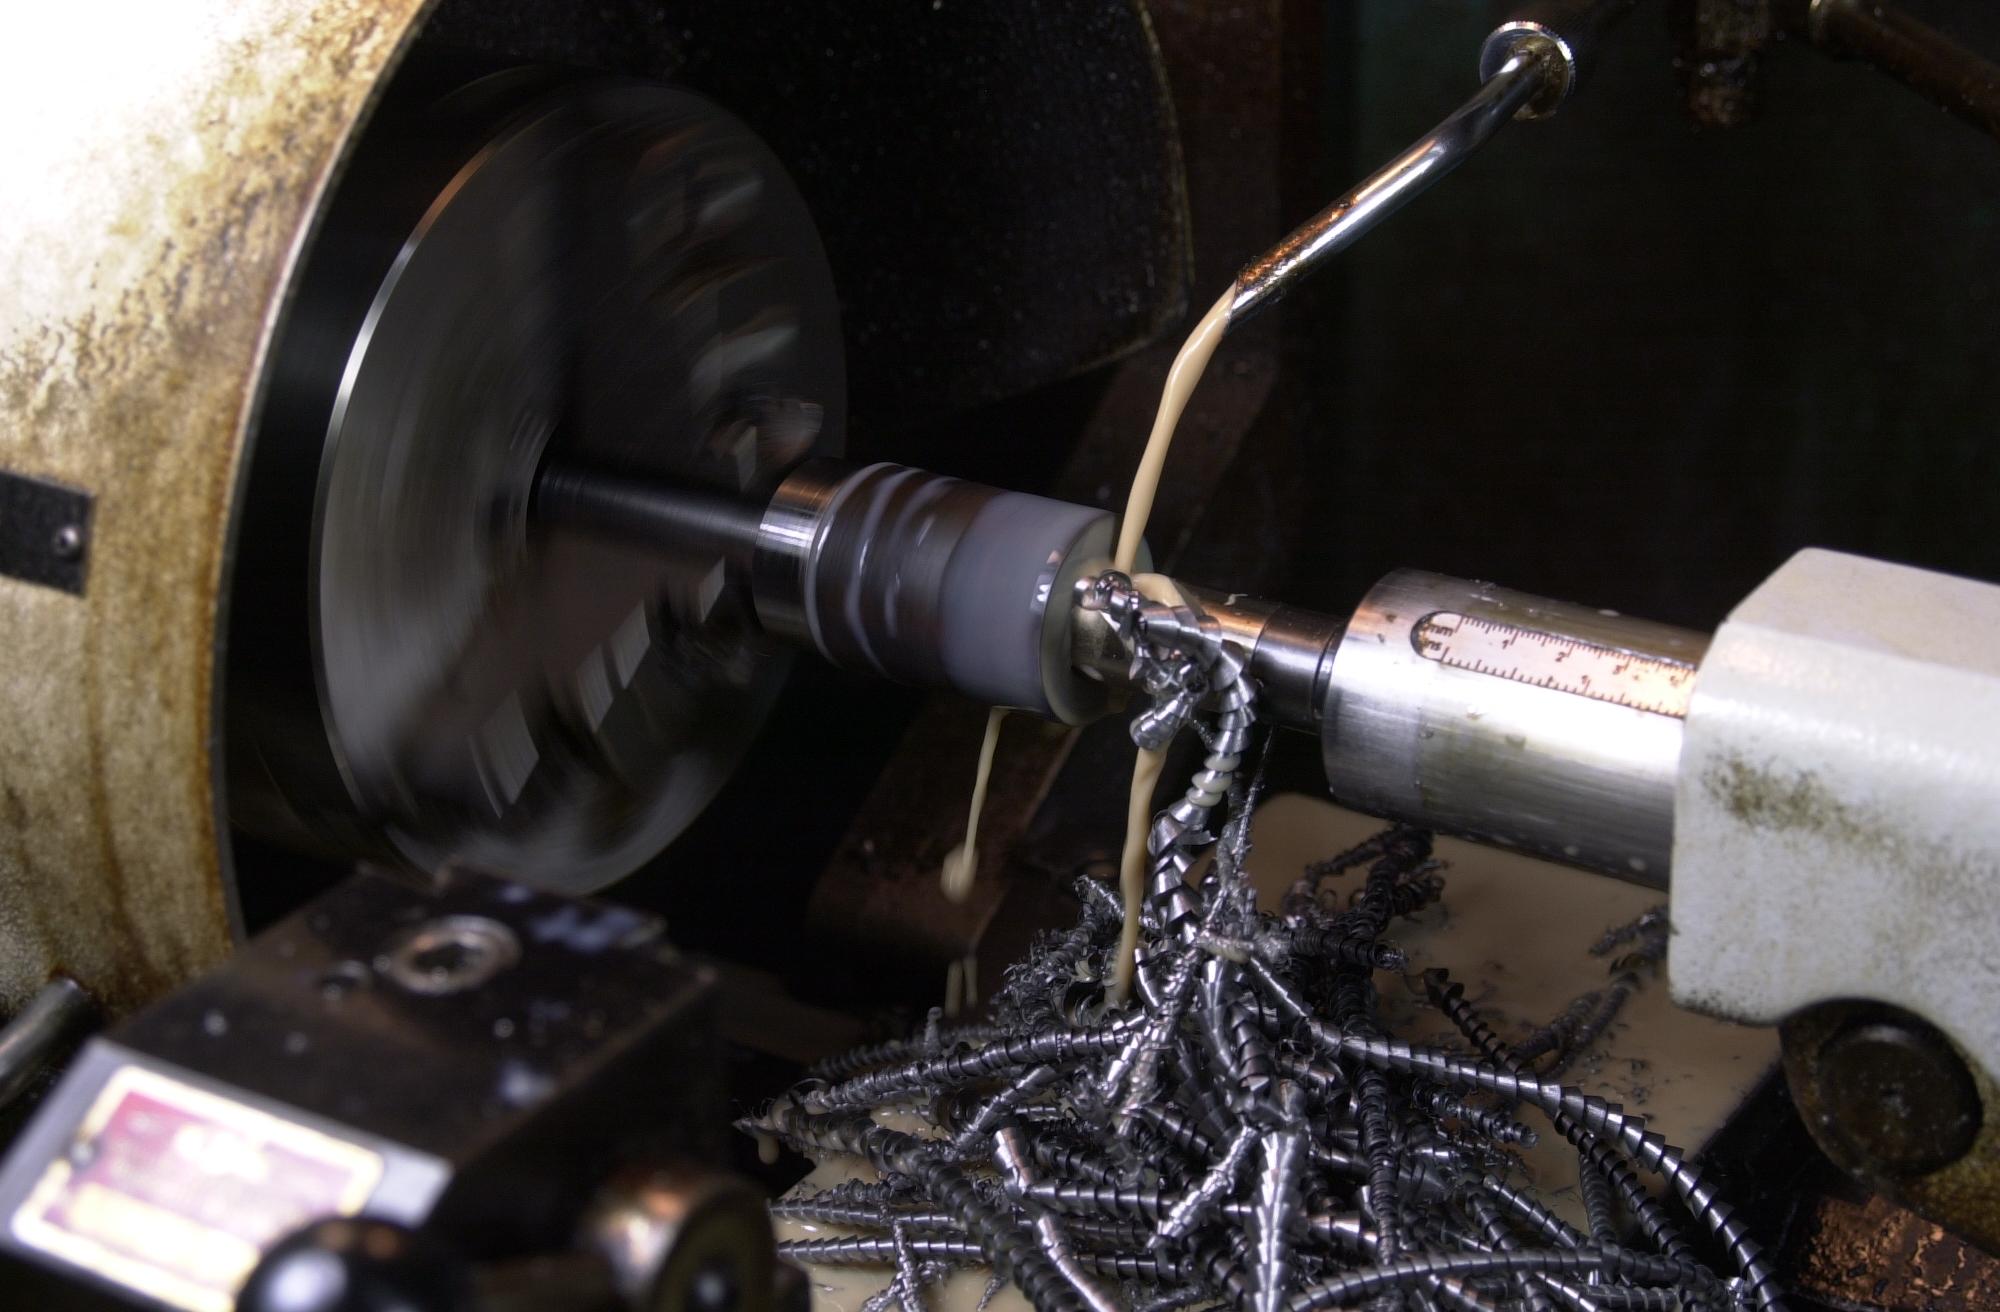 38.1mm brazed carbide mitre cutter body drilling.